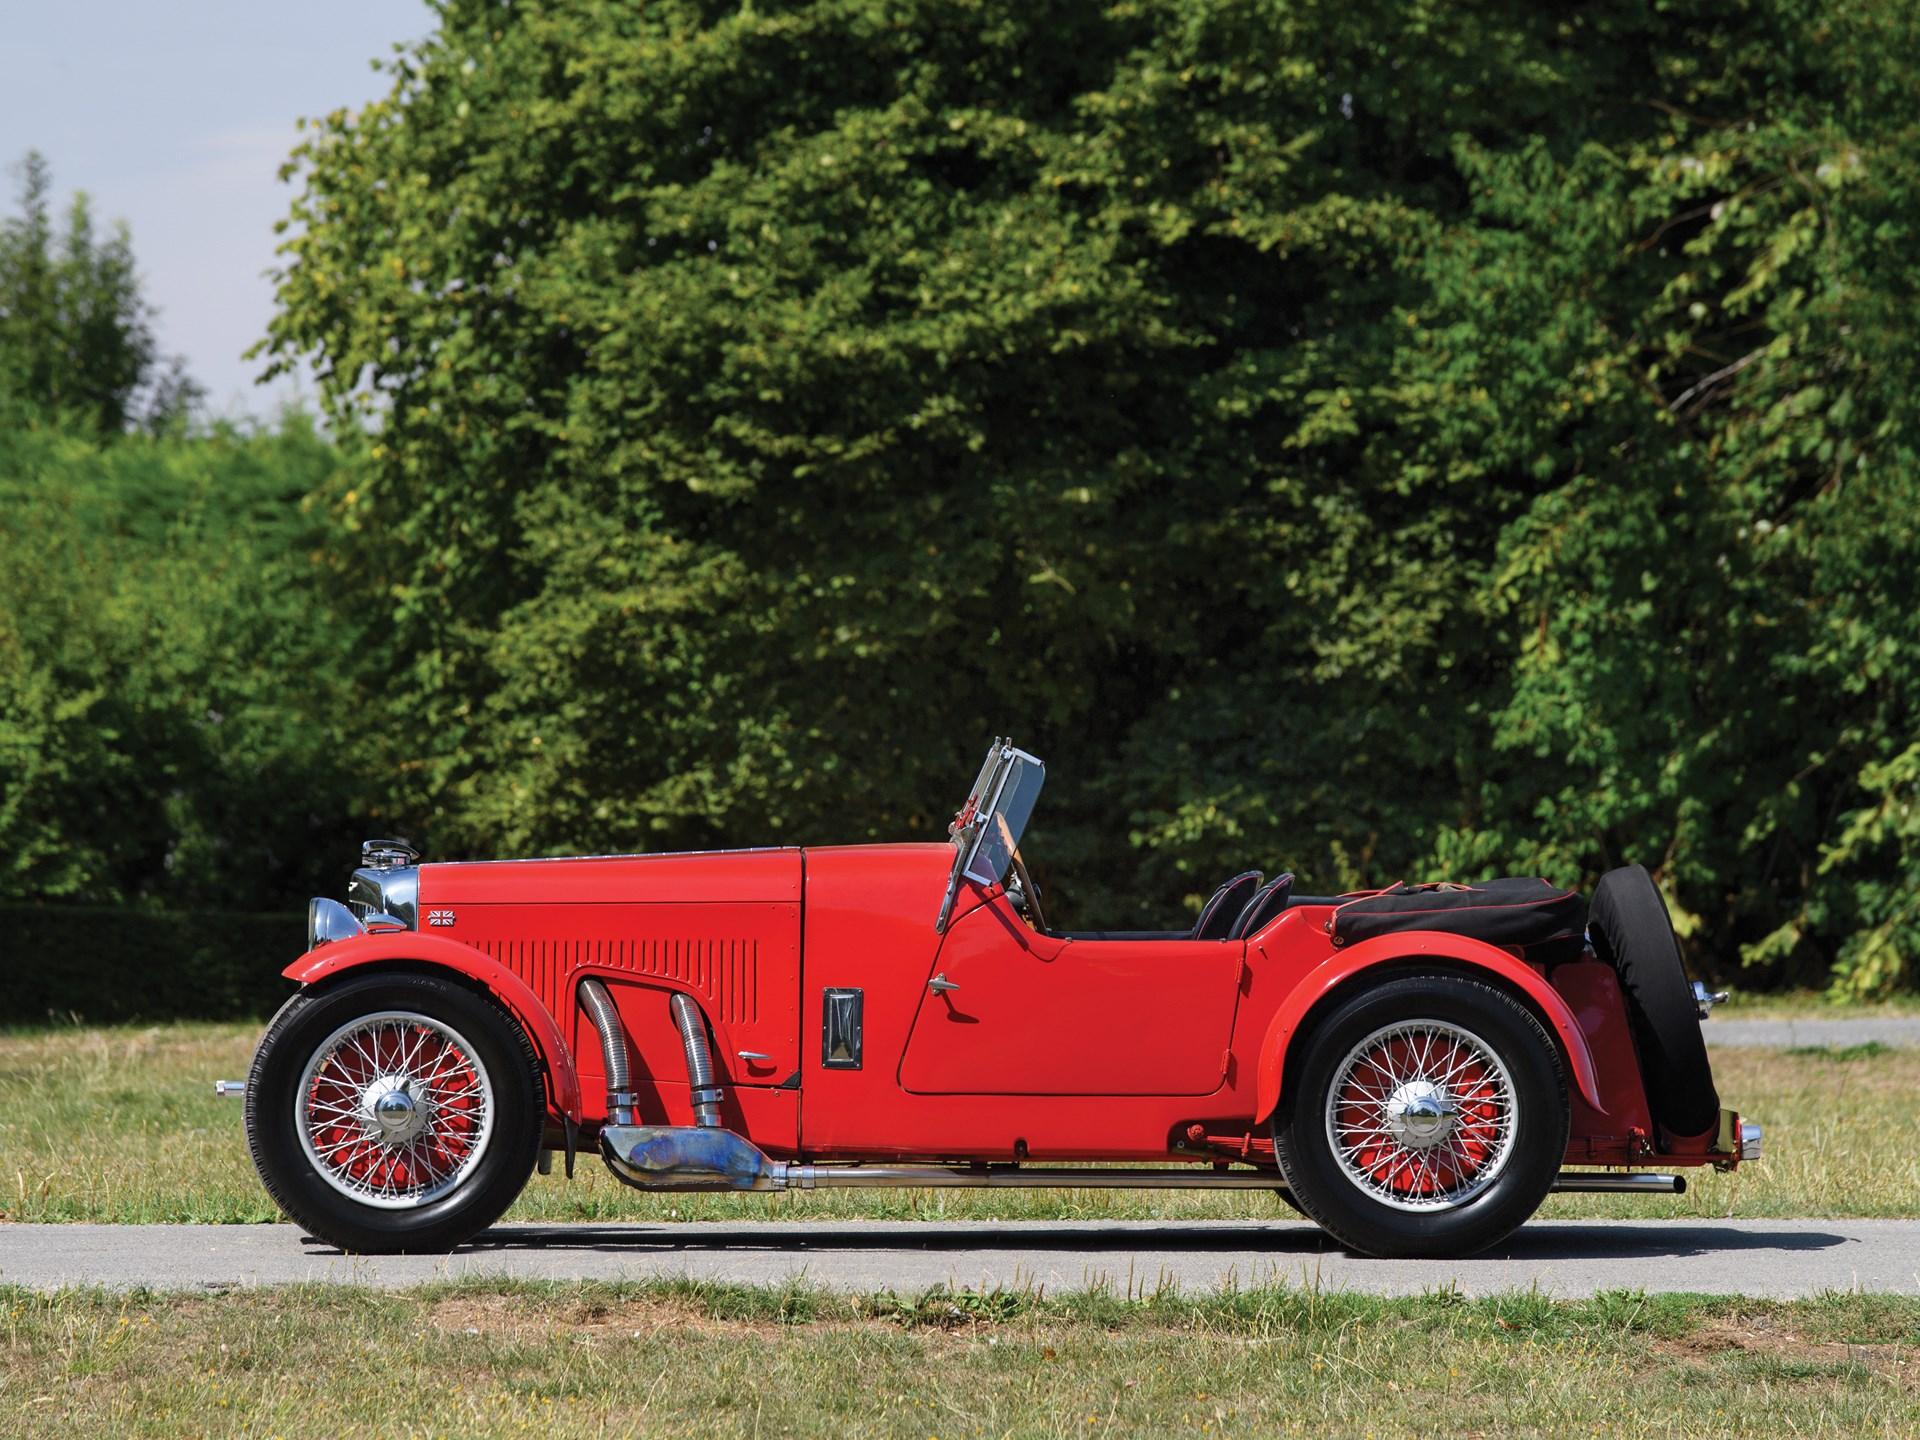 1934 Aston Martin 1½-Litre Mark II 2/4-Seater by Bertelli